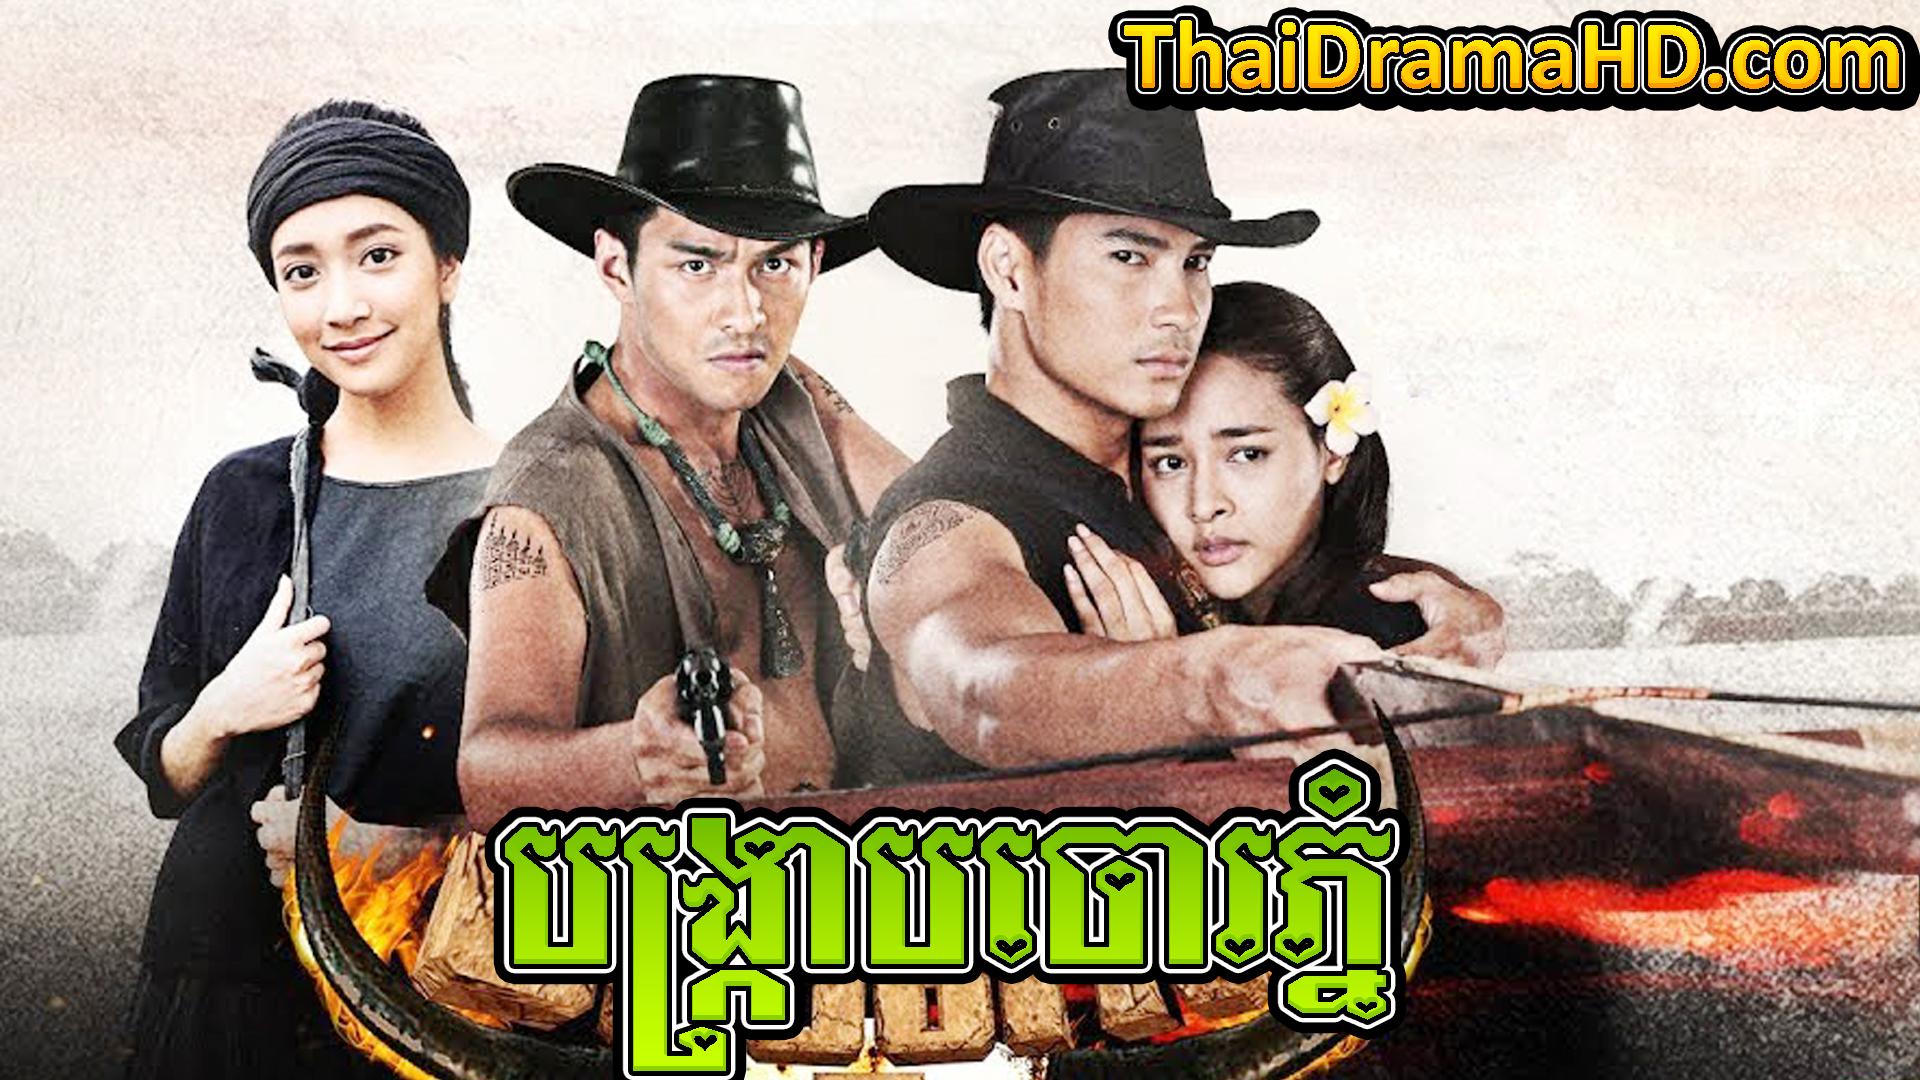 Nak Bangkrab Choa Phnom   Thai Drama   Khmer Movie   Phumikhmer   movie-khmer   video4khmer   khmotions   kolabkhmer   khmer drama   ksdrama   cookingtips   roscheat   khmertimeskh   khmerkomsan   phumi7   merlkon   film2us   movie2kh   sweetdrama   khmercitylove   khreplay   tvb cambodia drama   ckh7   srokthai   phumimedia   phumi8   khmer avenue   khmer search   Soyo   khmerfans